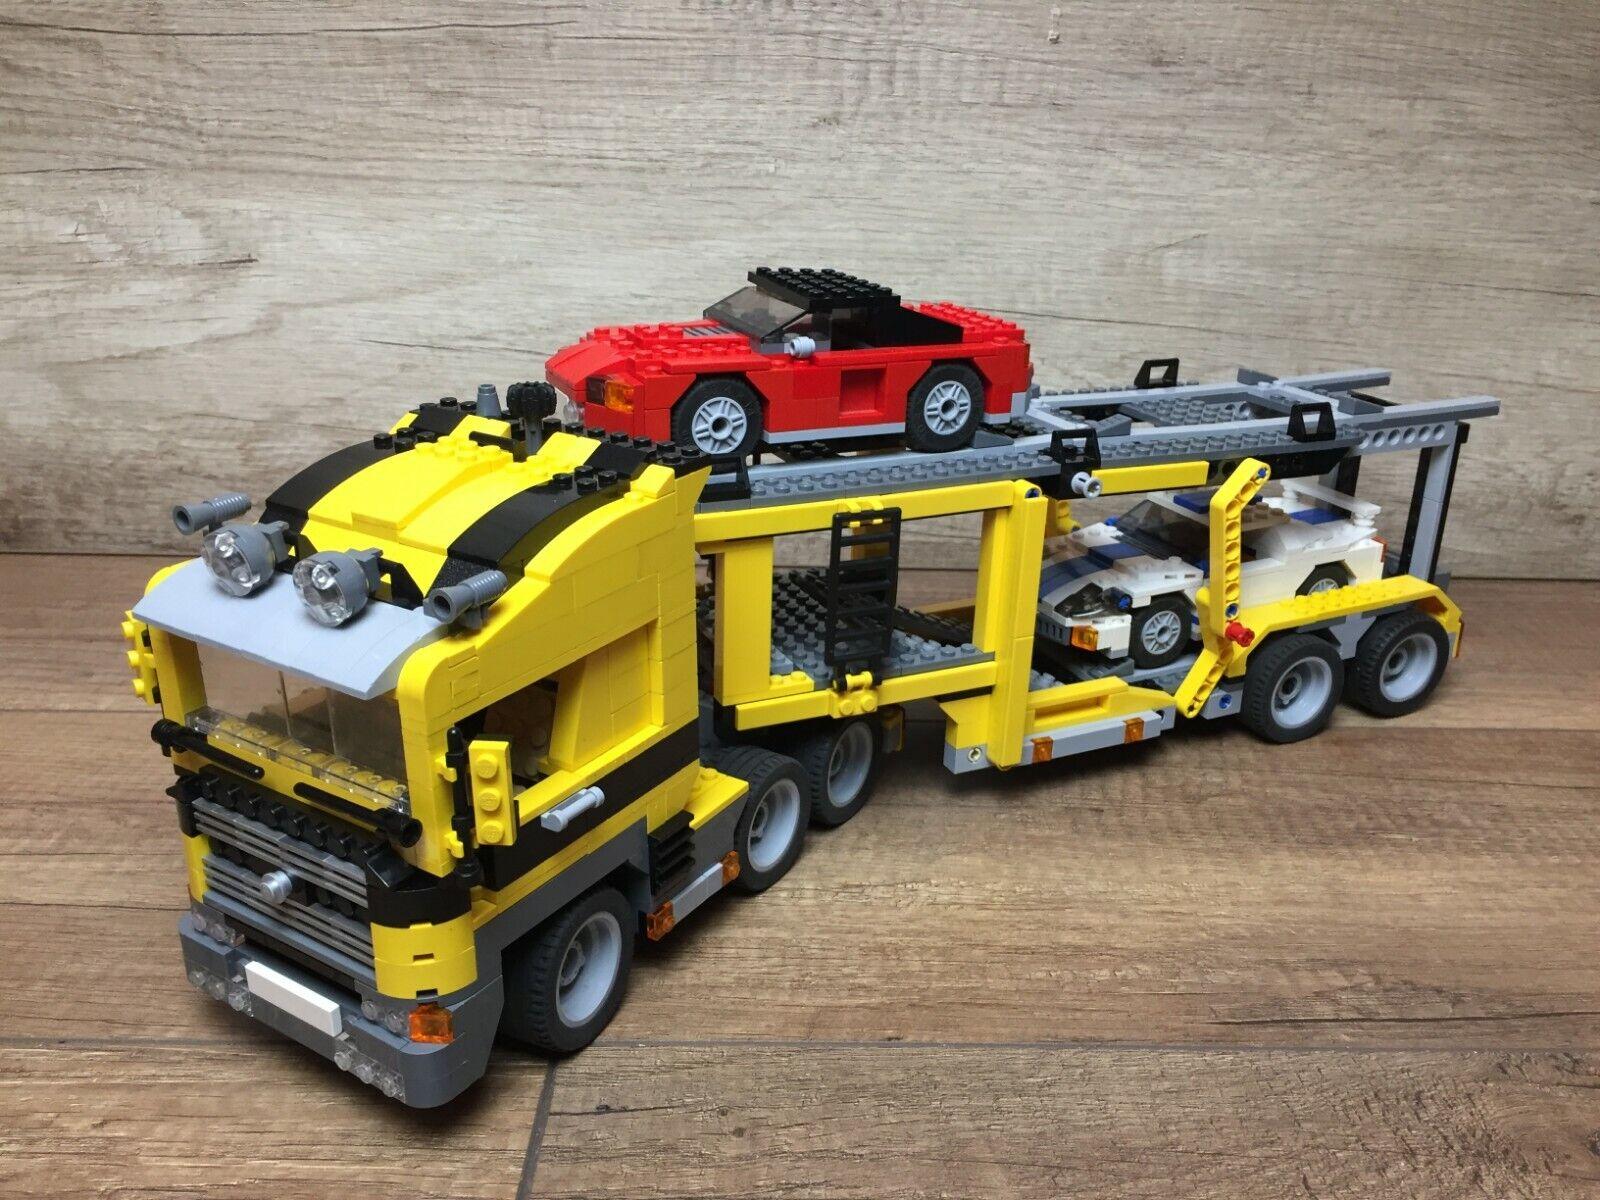 Lego 6753 Highway Transport Creator Model LKW Auto-Transporter komplett complete